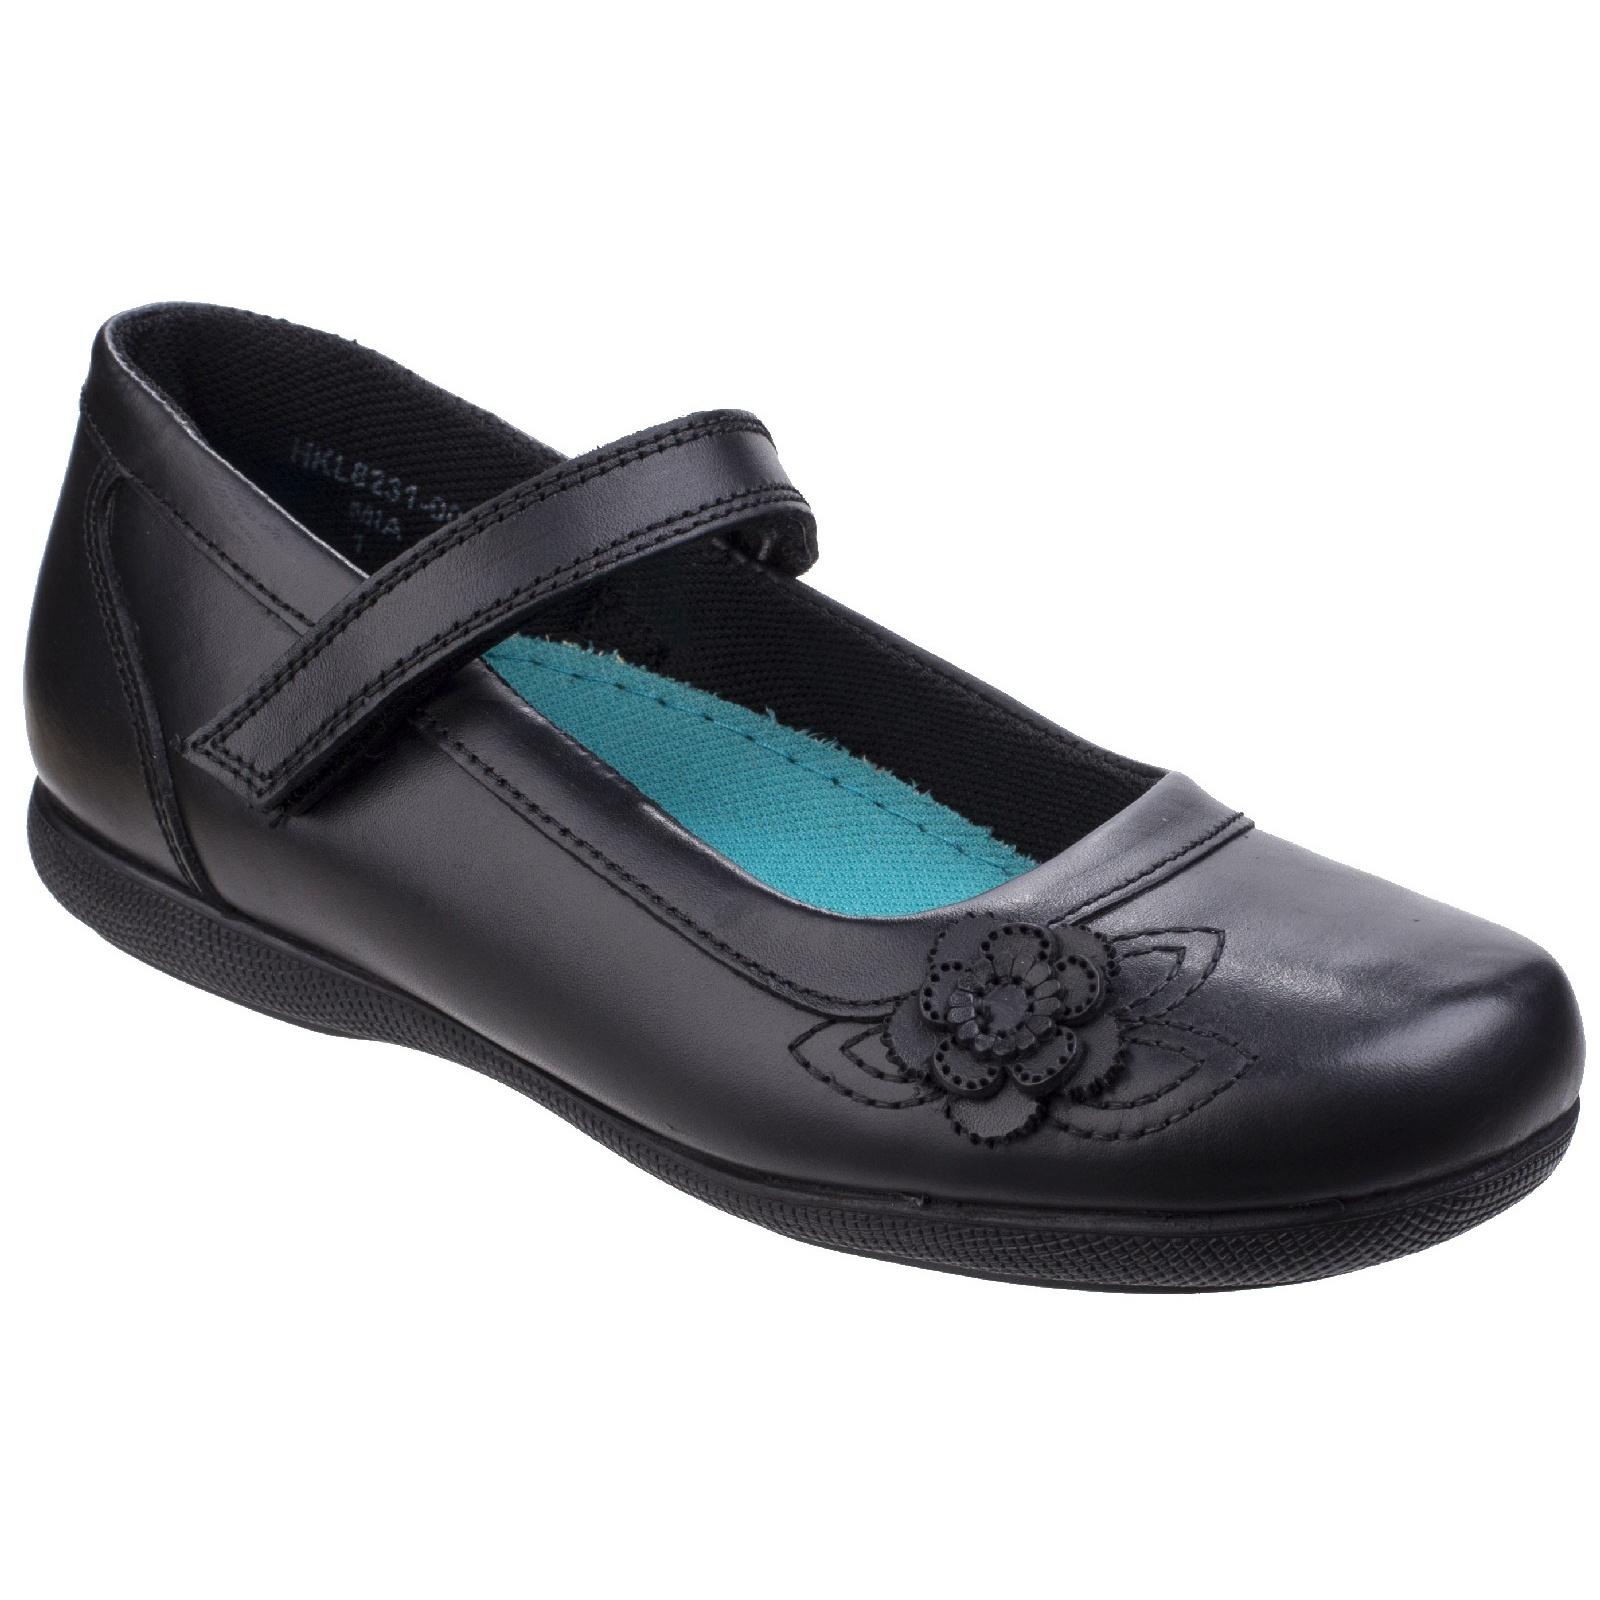 Hush-Puppies-Childrens-Girls-Senior-Mia-School-Shoes-FS4524